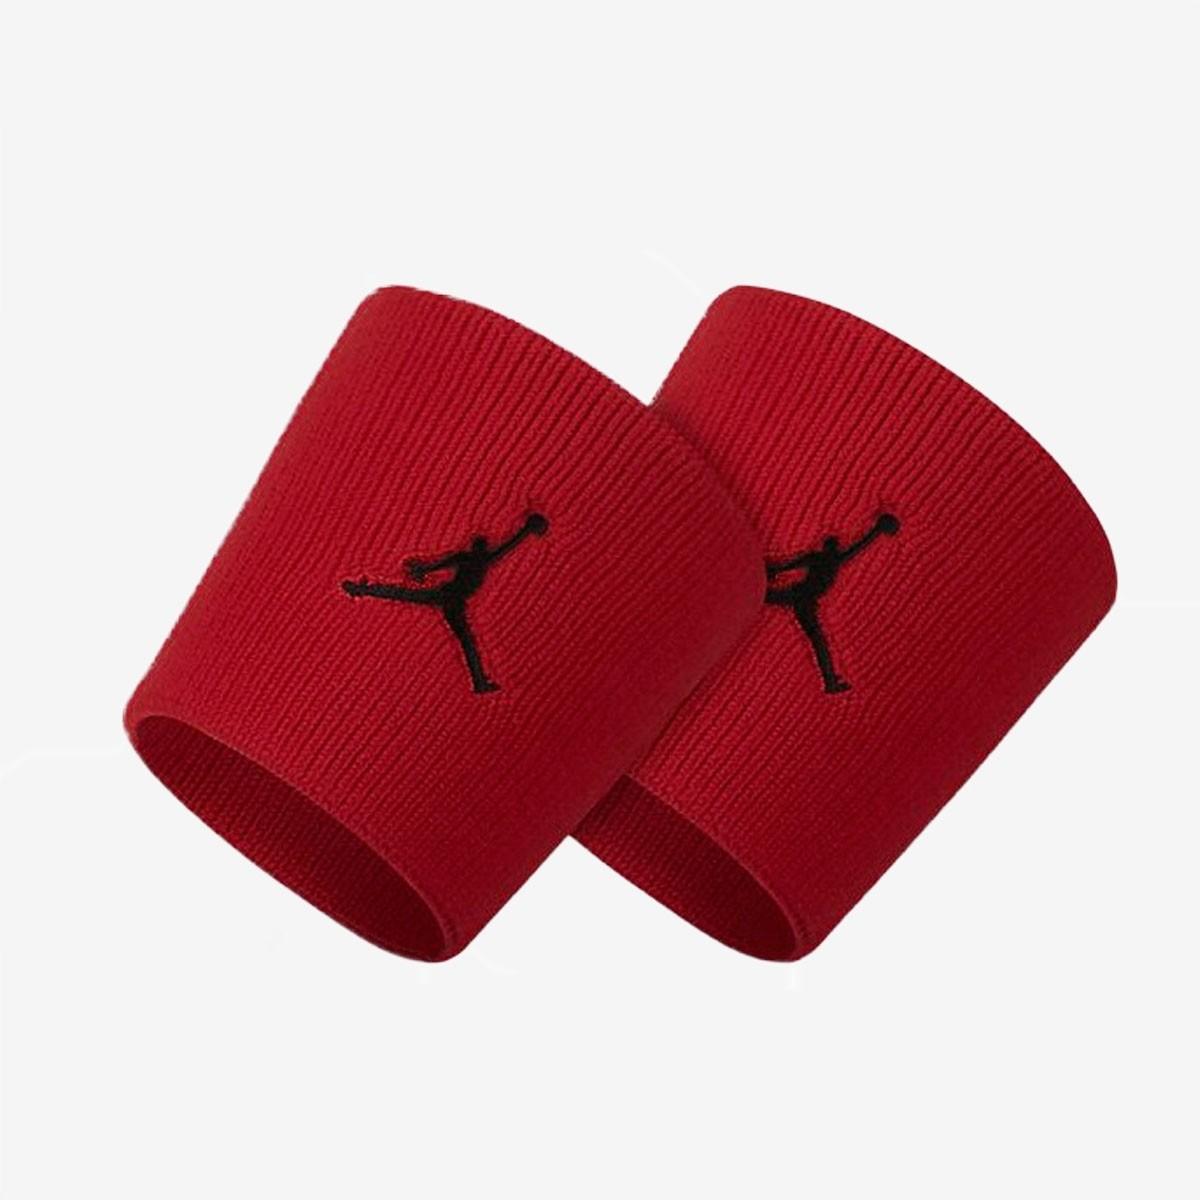 Jordan Wristband 'Red'